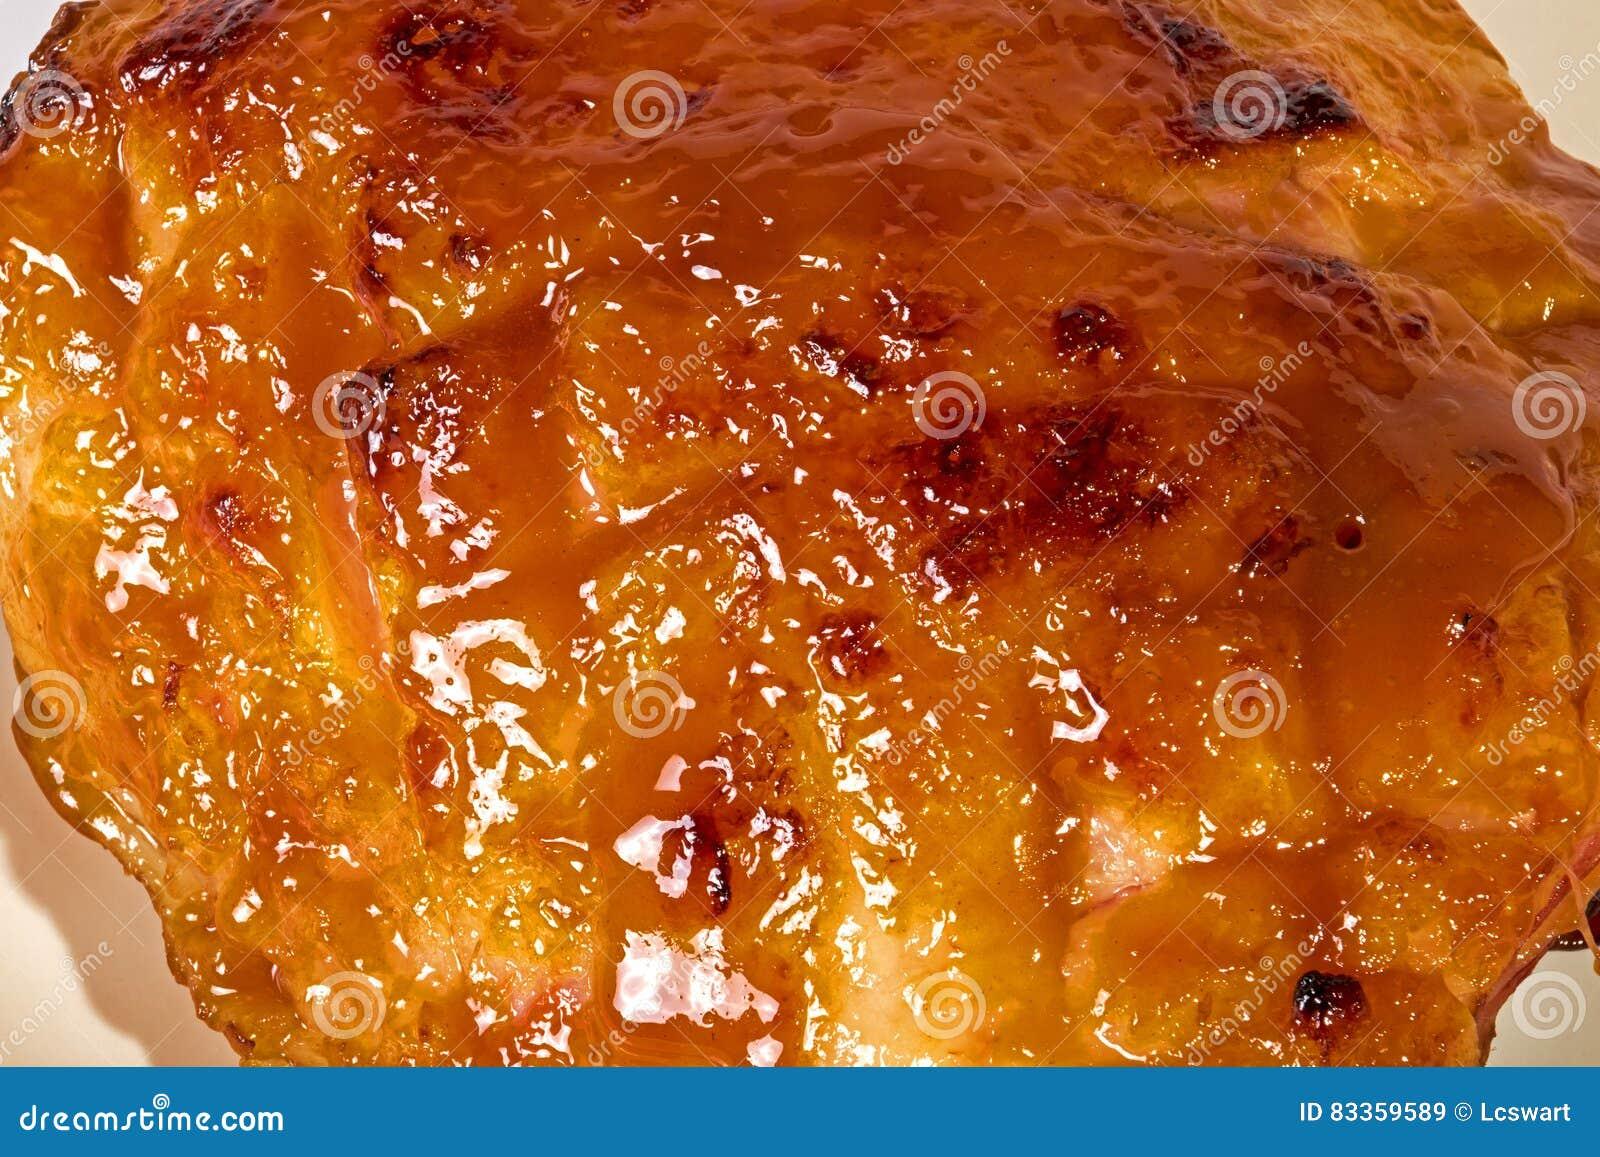 Close up of Baked Gammon Covered with Honey Based Glaze on White